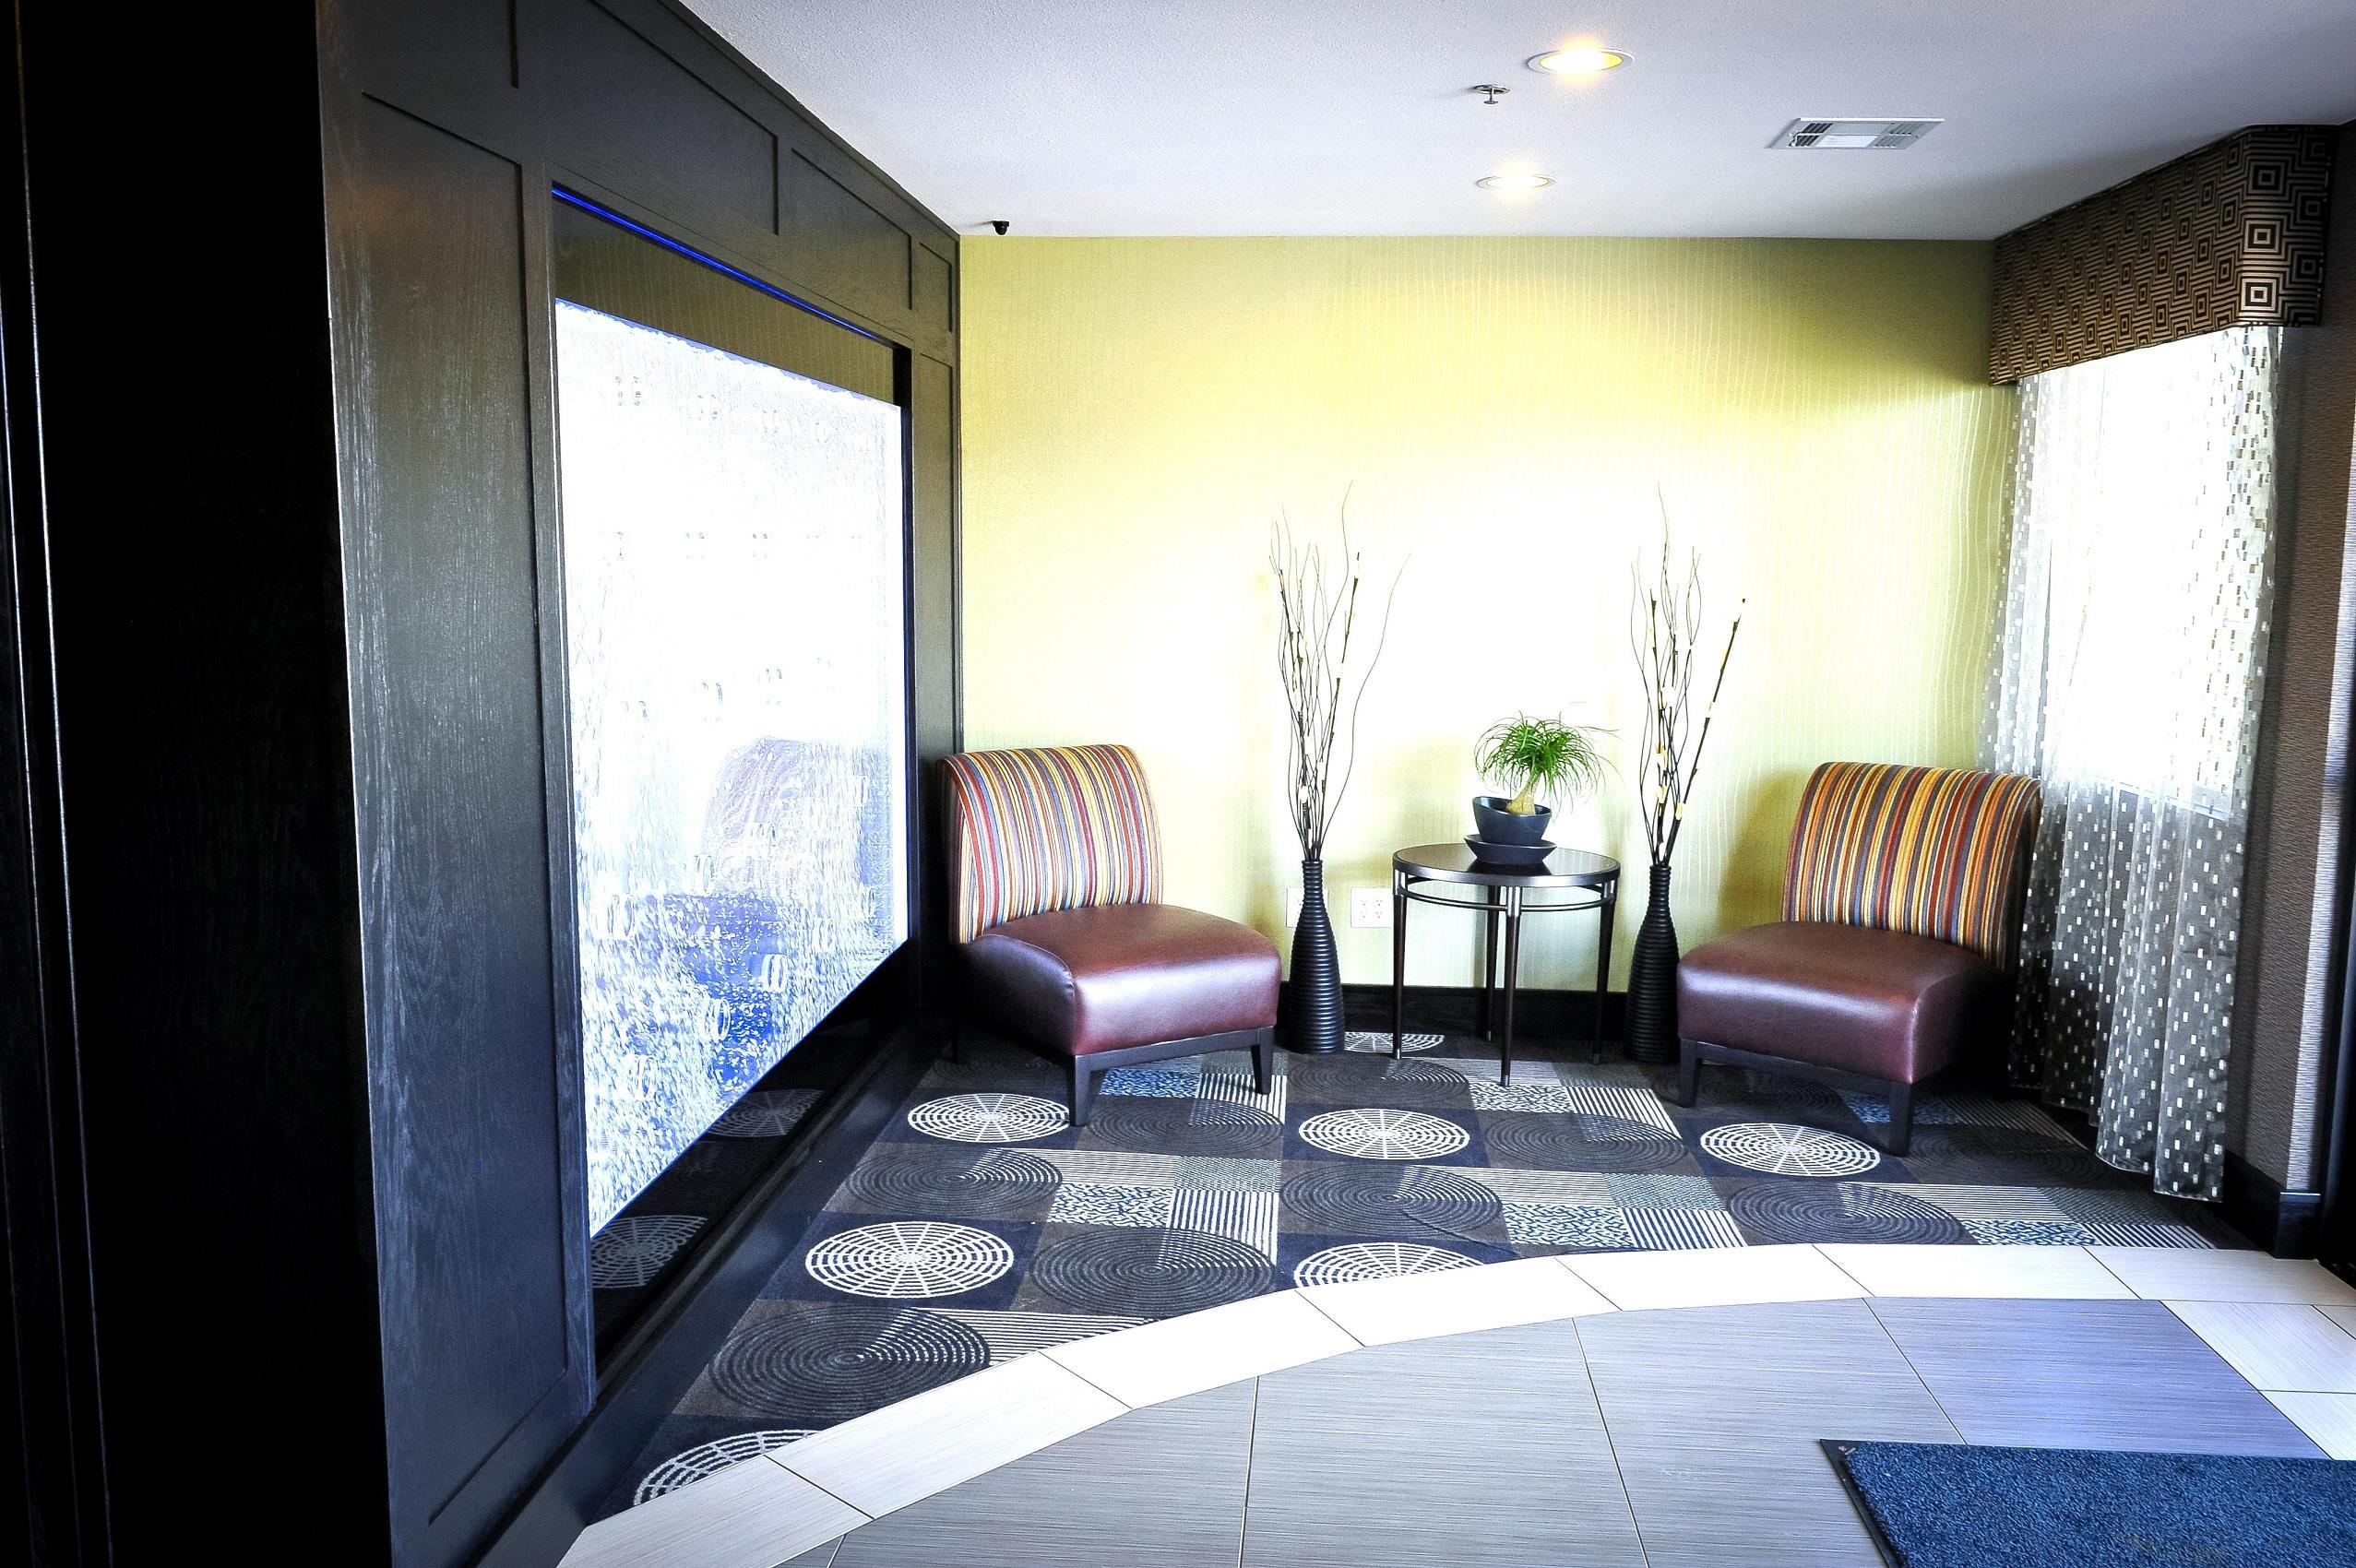 Best Western Plus Arlington North Hotel & Suites image 4